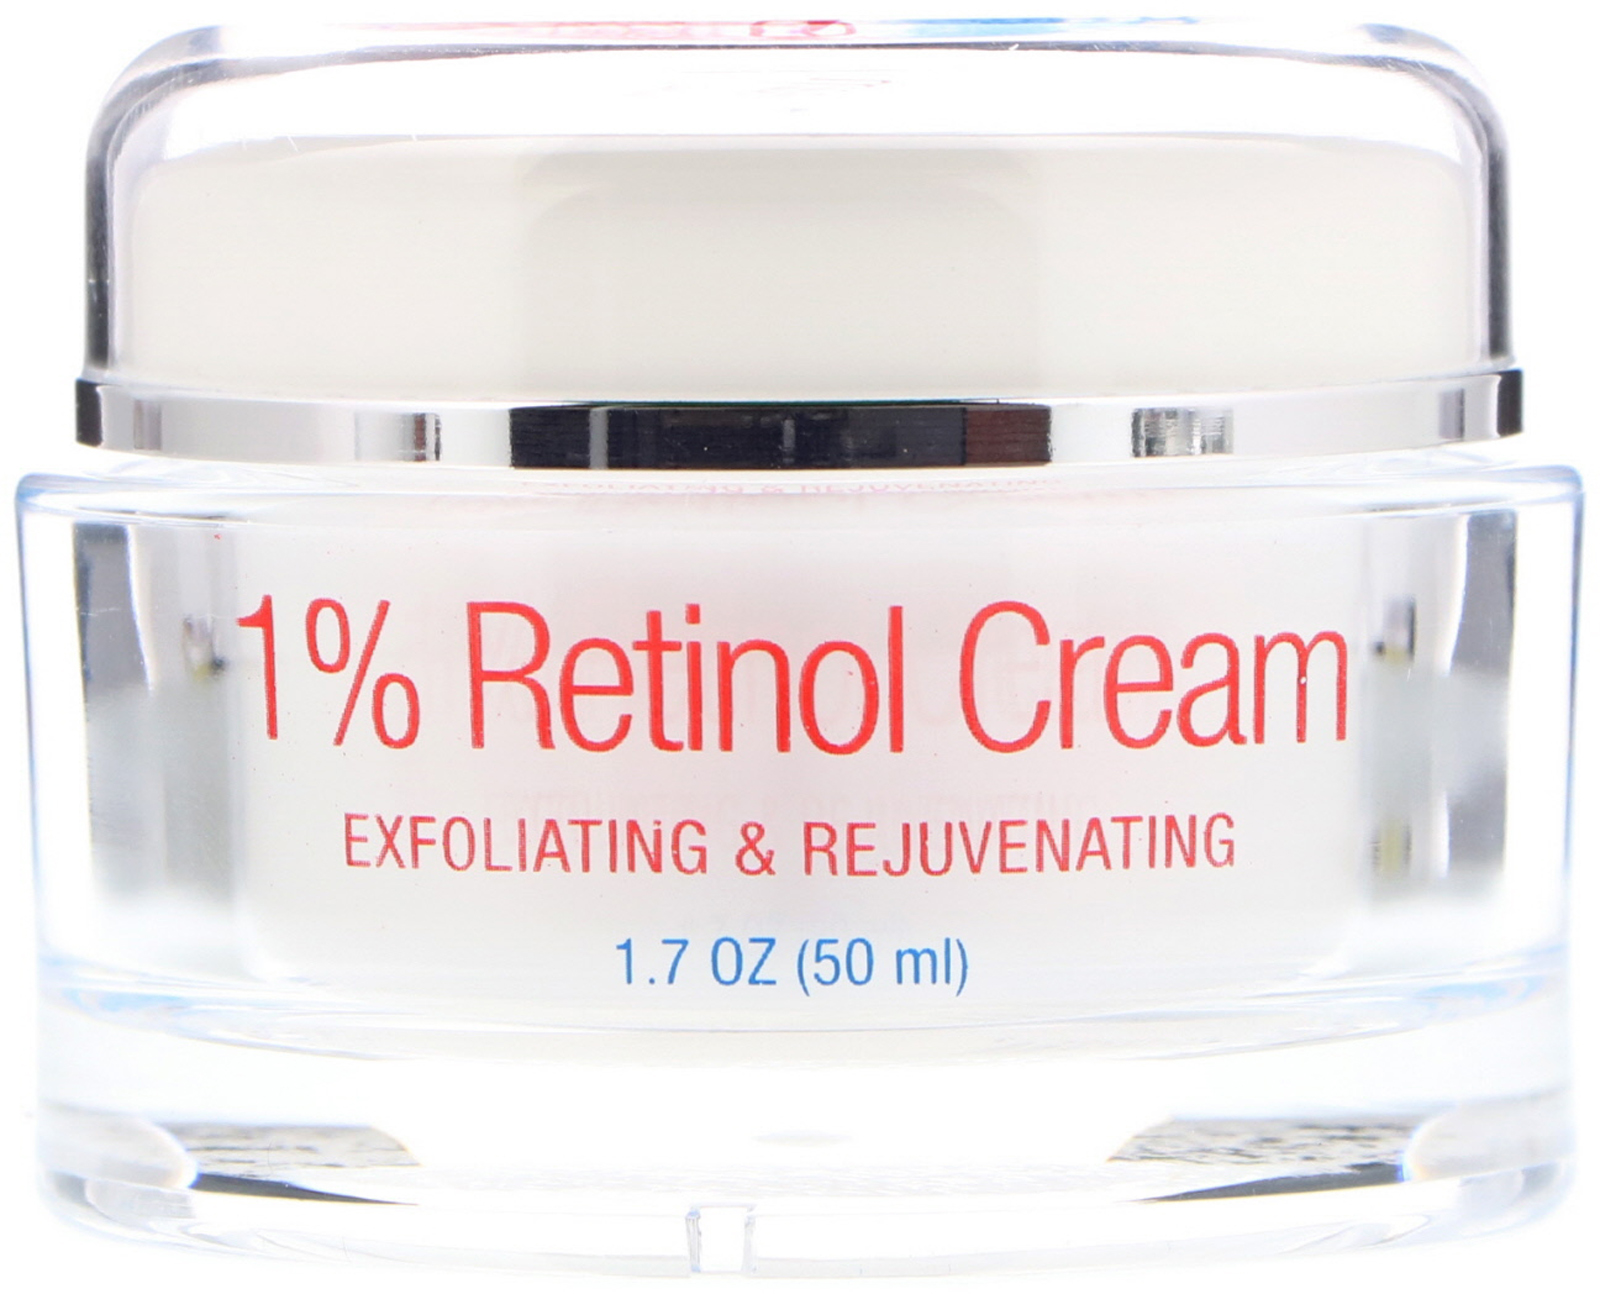 AllVia, 1% Retinol Cream, 1 7 oz (50 ml) - iHerb com